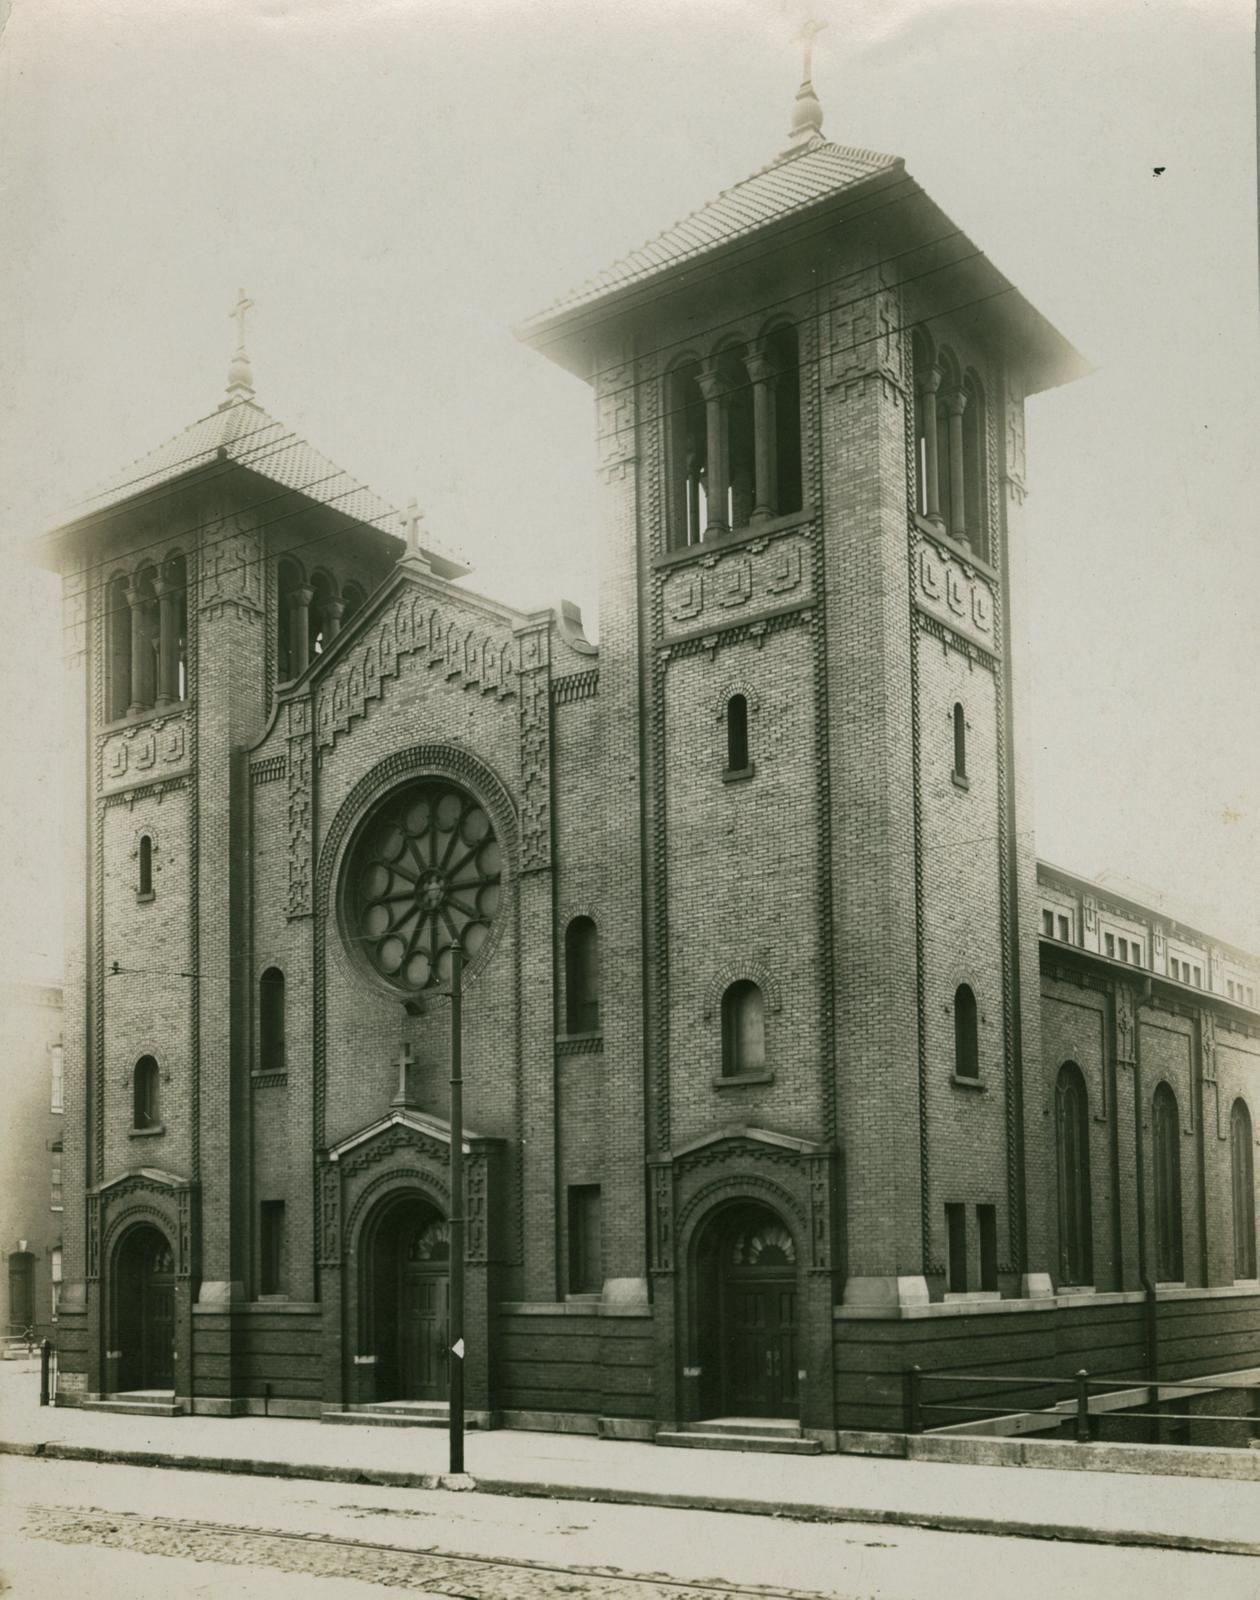 Saint Dominic's Catholic Church, Chicago, 1913